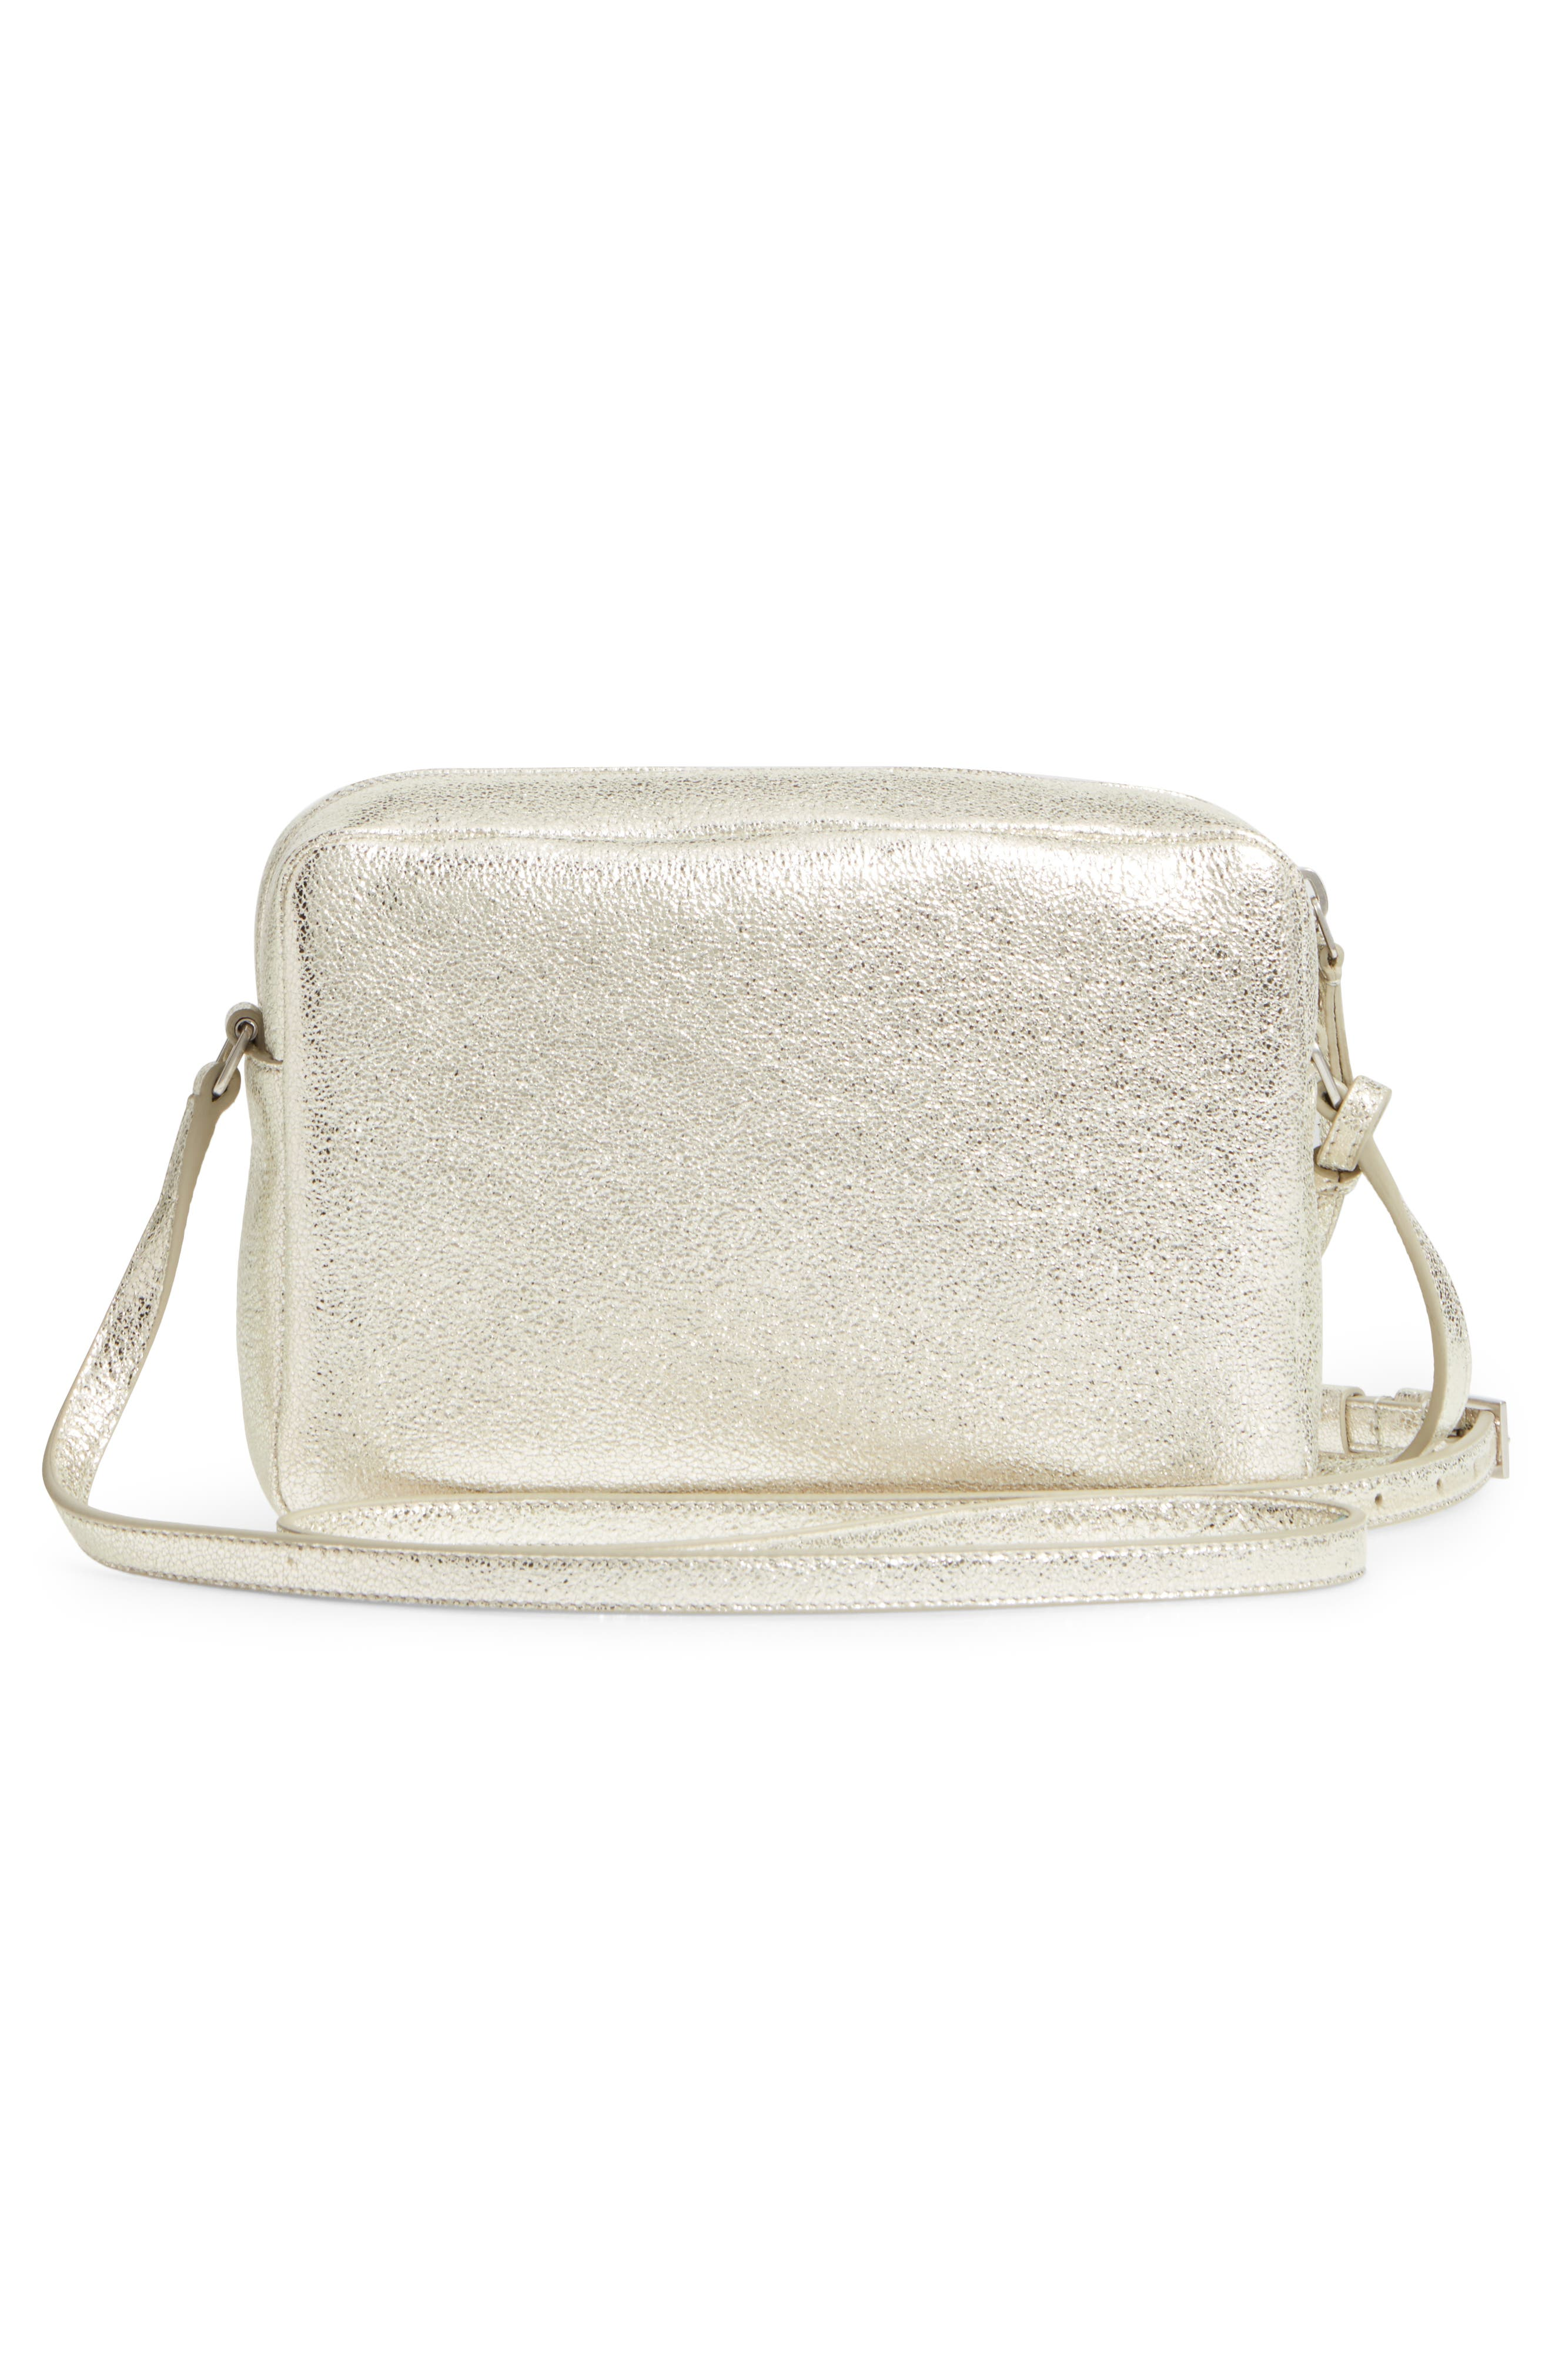 Alternate Image 3  - Saint Laurent Medium Lou Leather Camera Bag